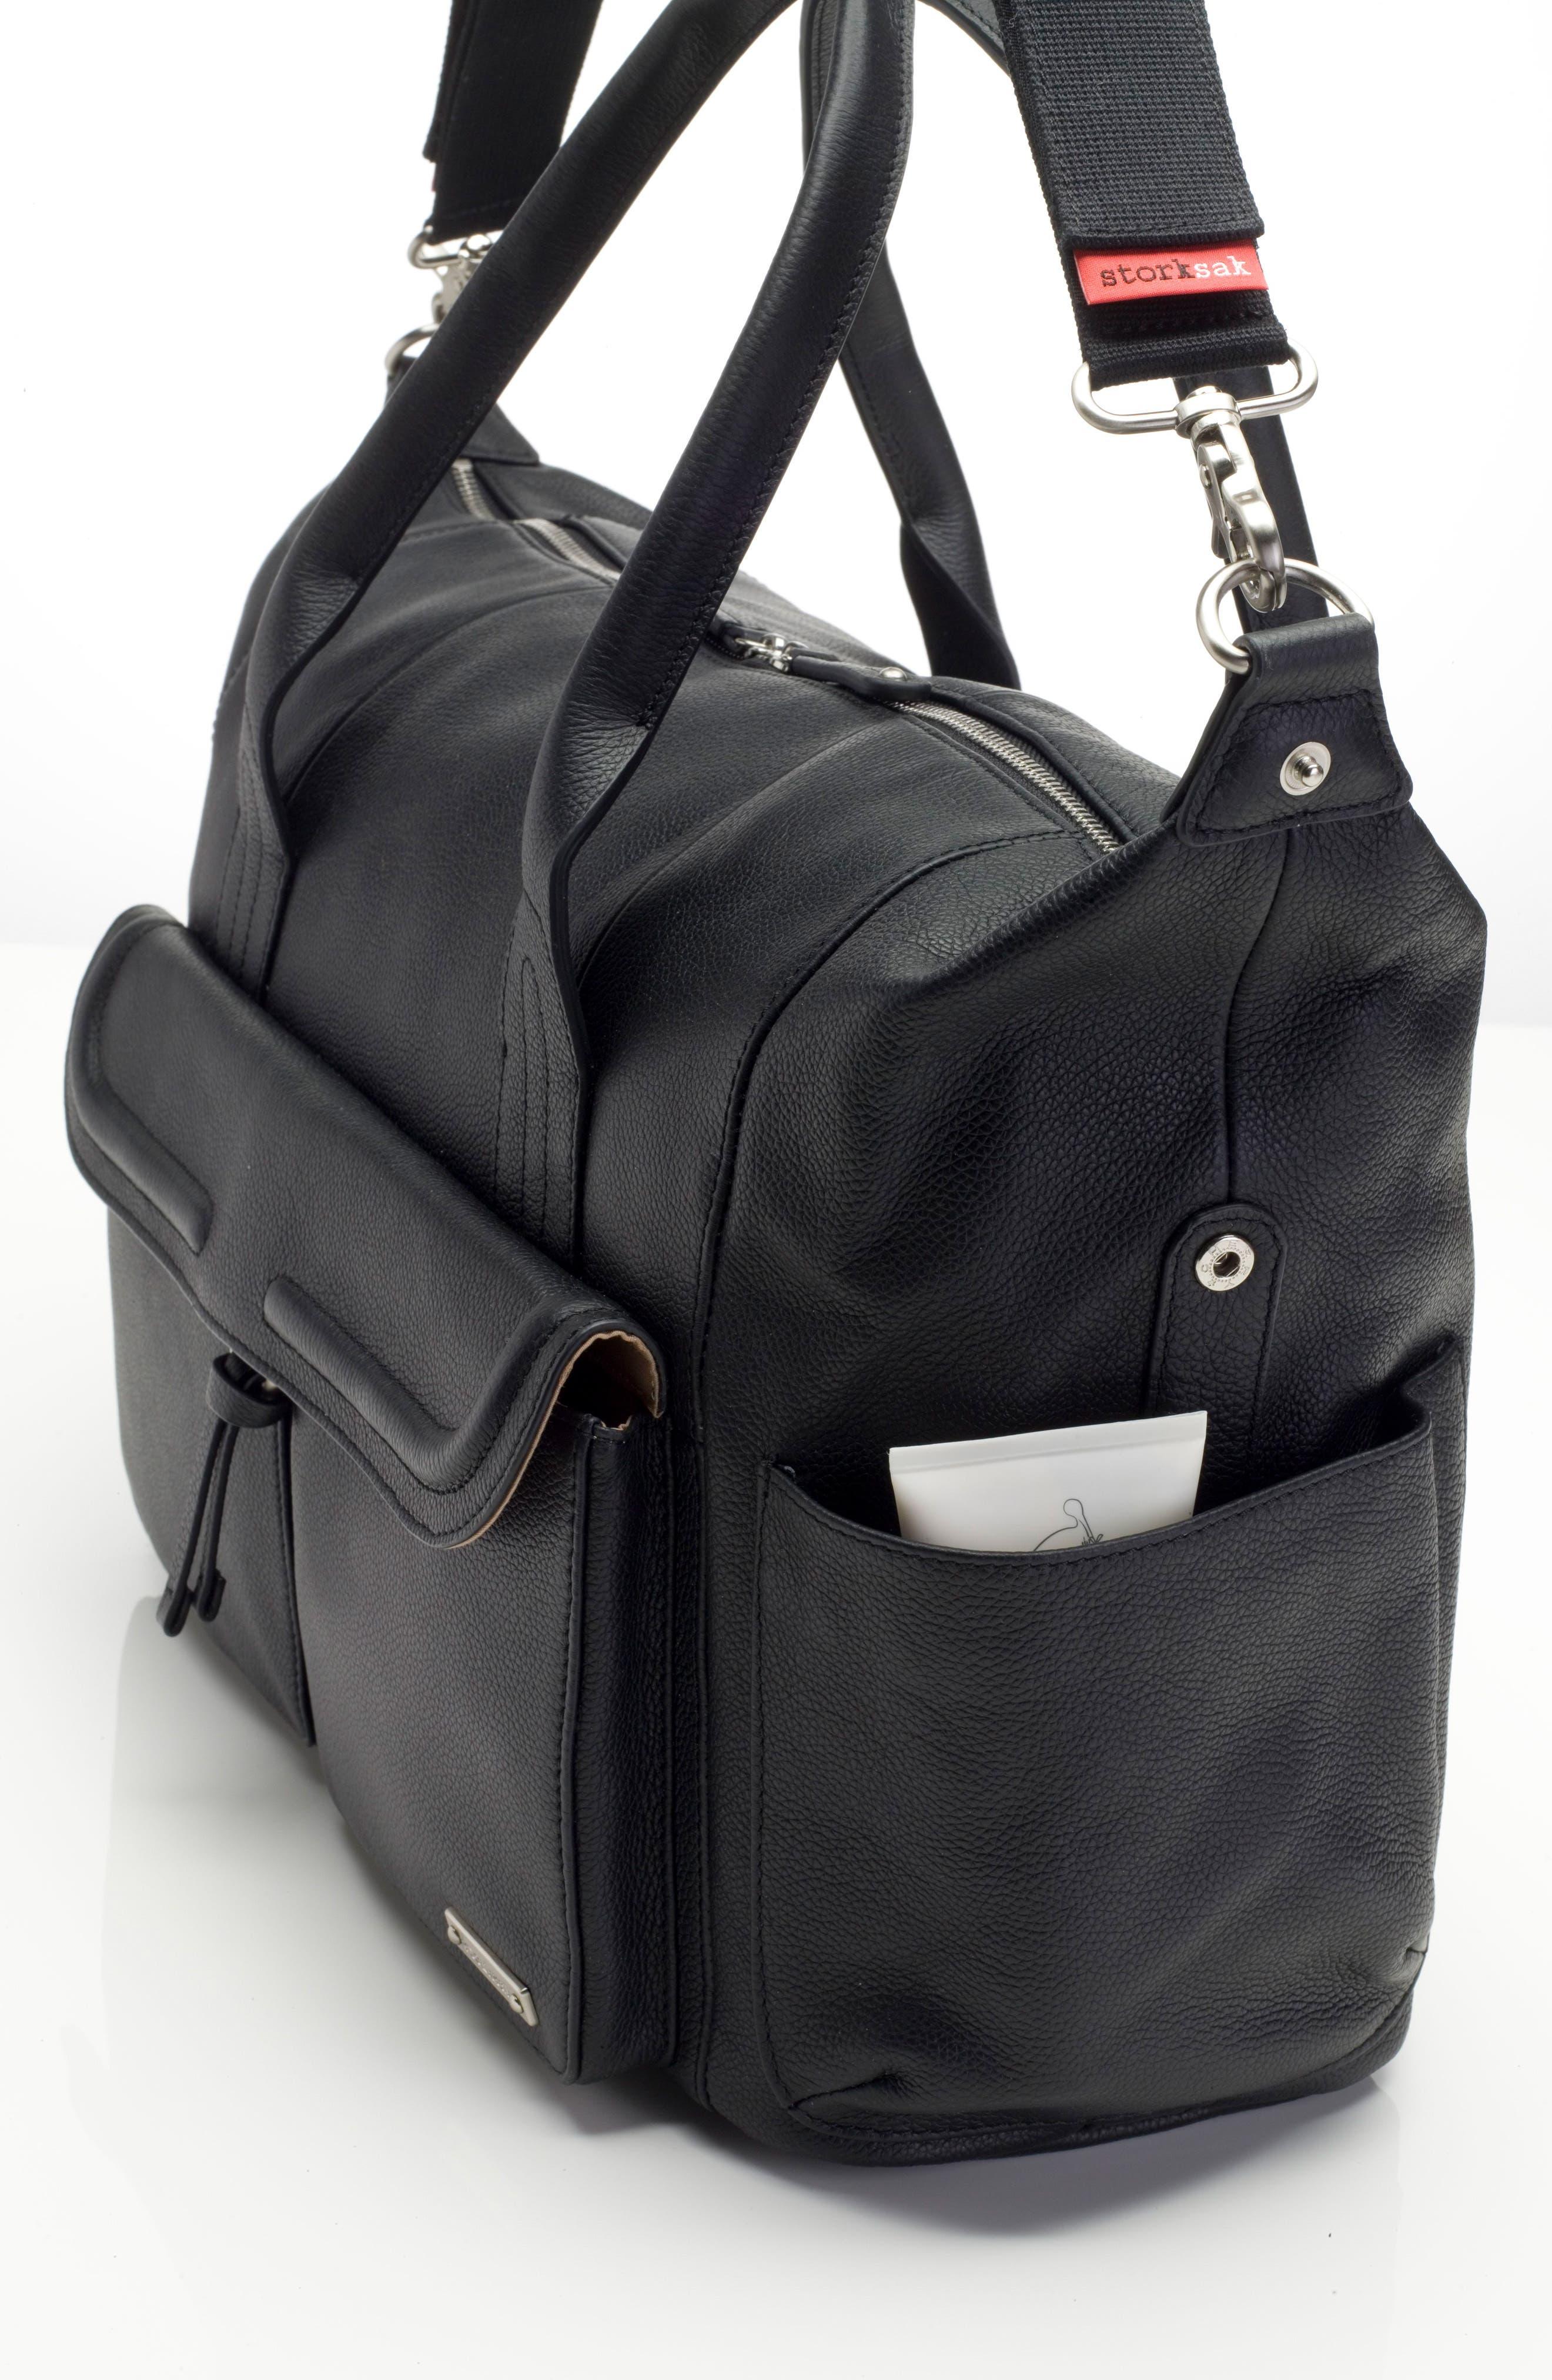 Storsak Leather Diaper Bag,                             Alternate thumbnail 5, color,                             BLACK